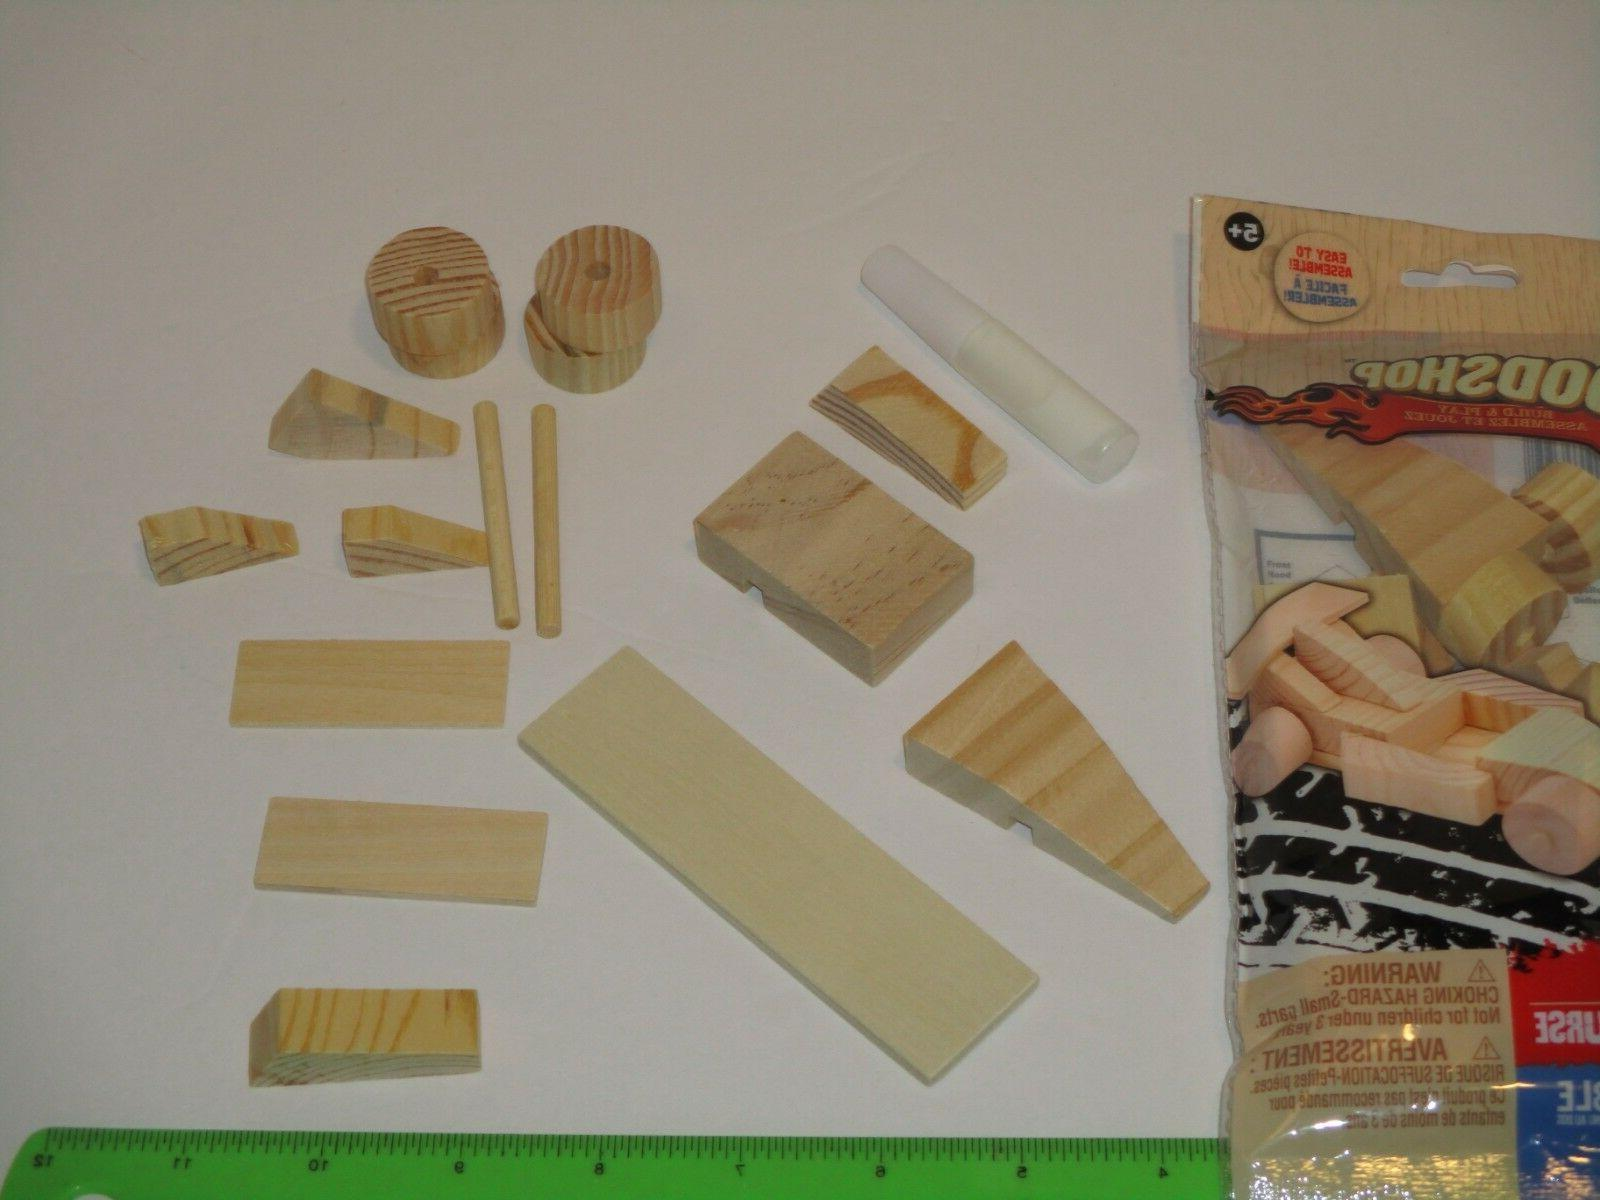 Wood Shop Model Kit - Wooden Toy, w/Glue